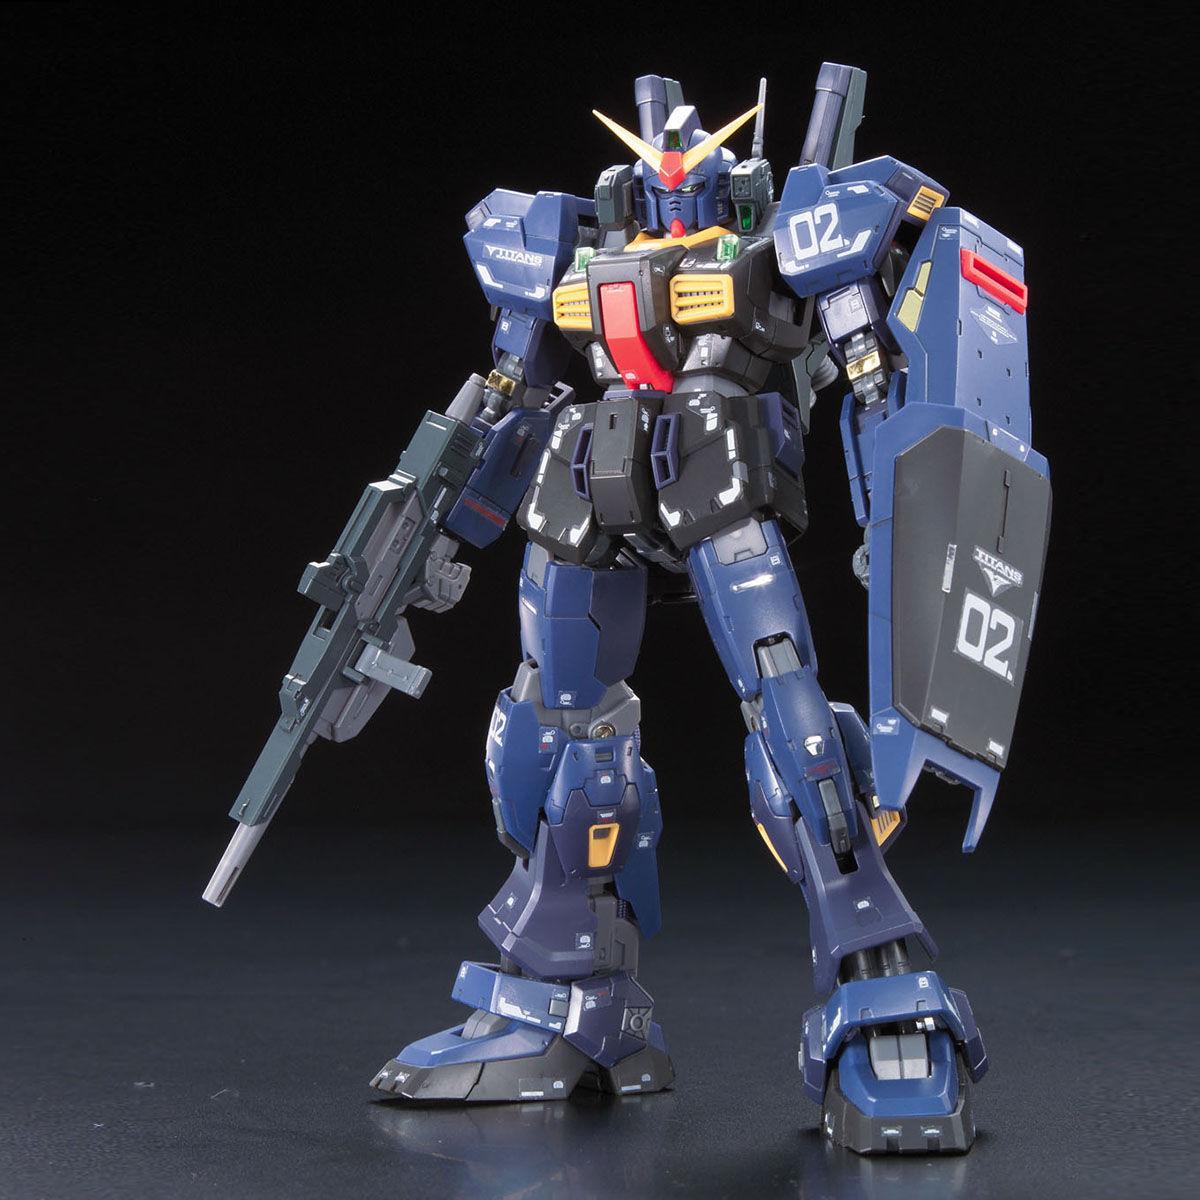 RG 1/144 鋼彈Mk-Ⅱ(迪坦斯規格)